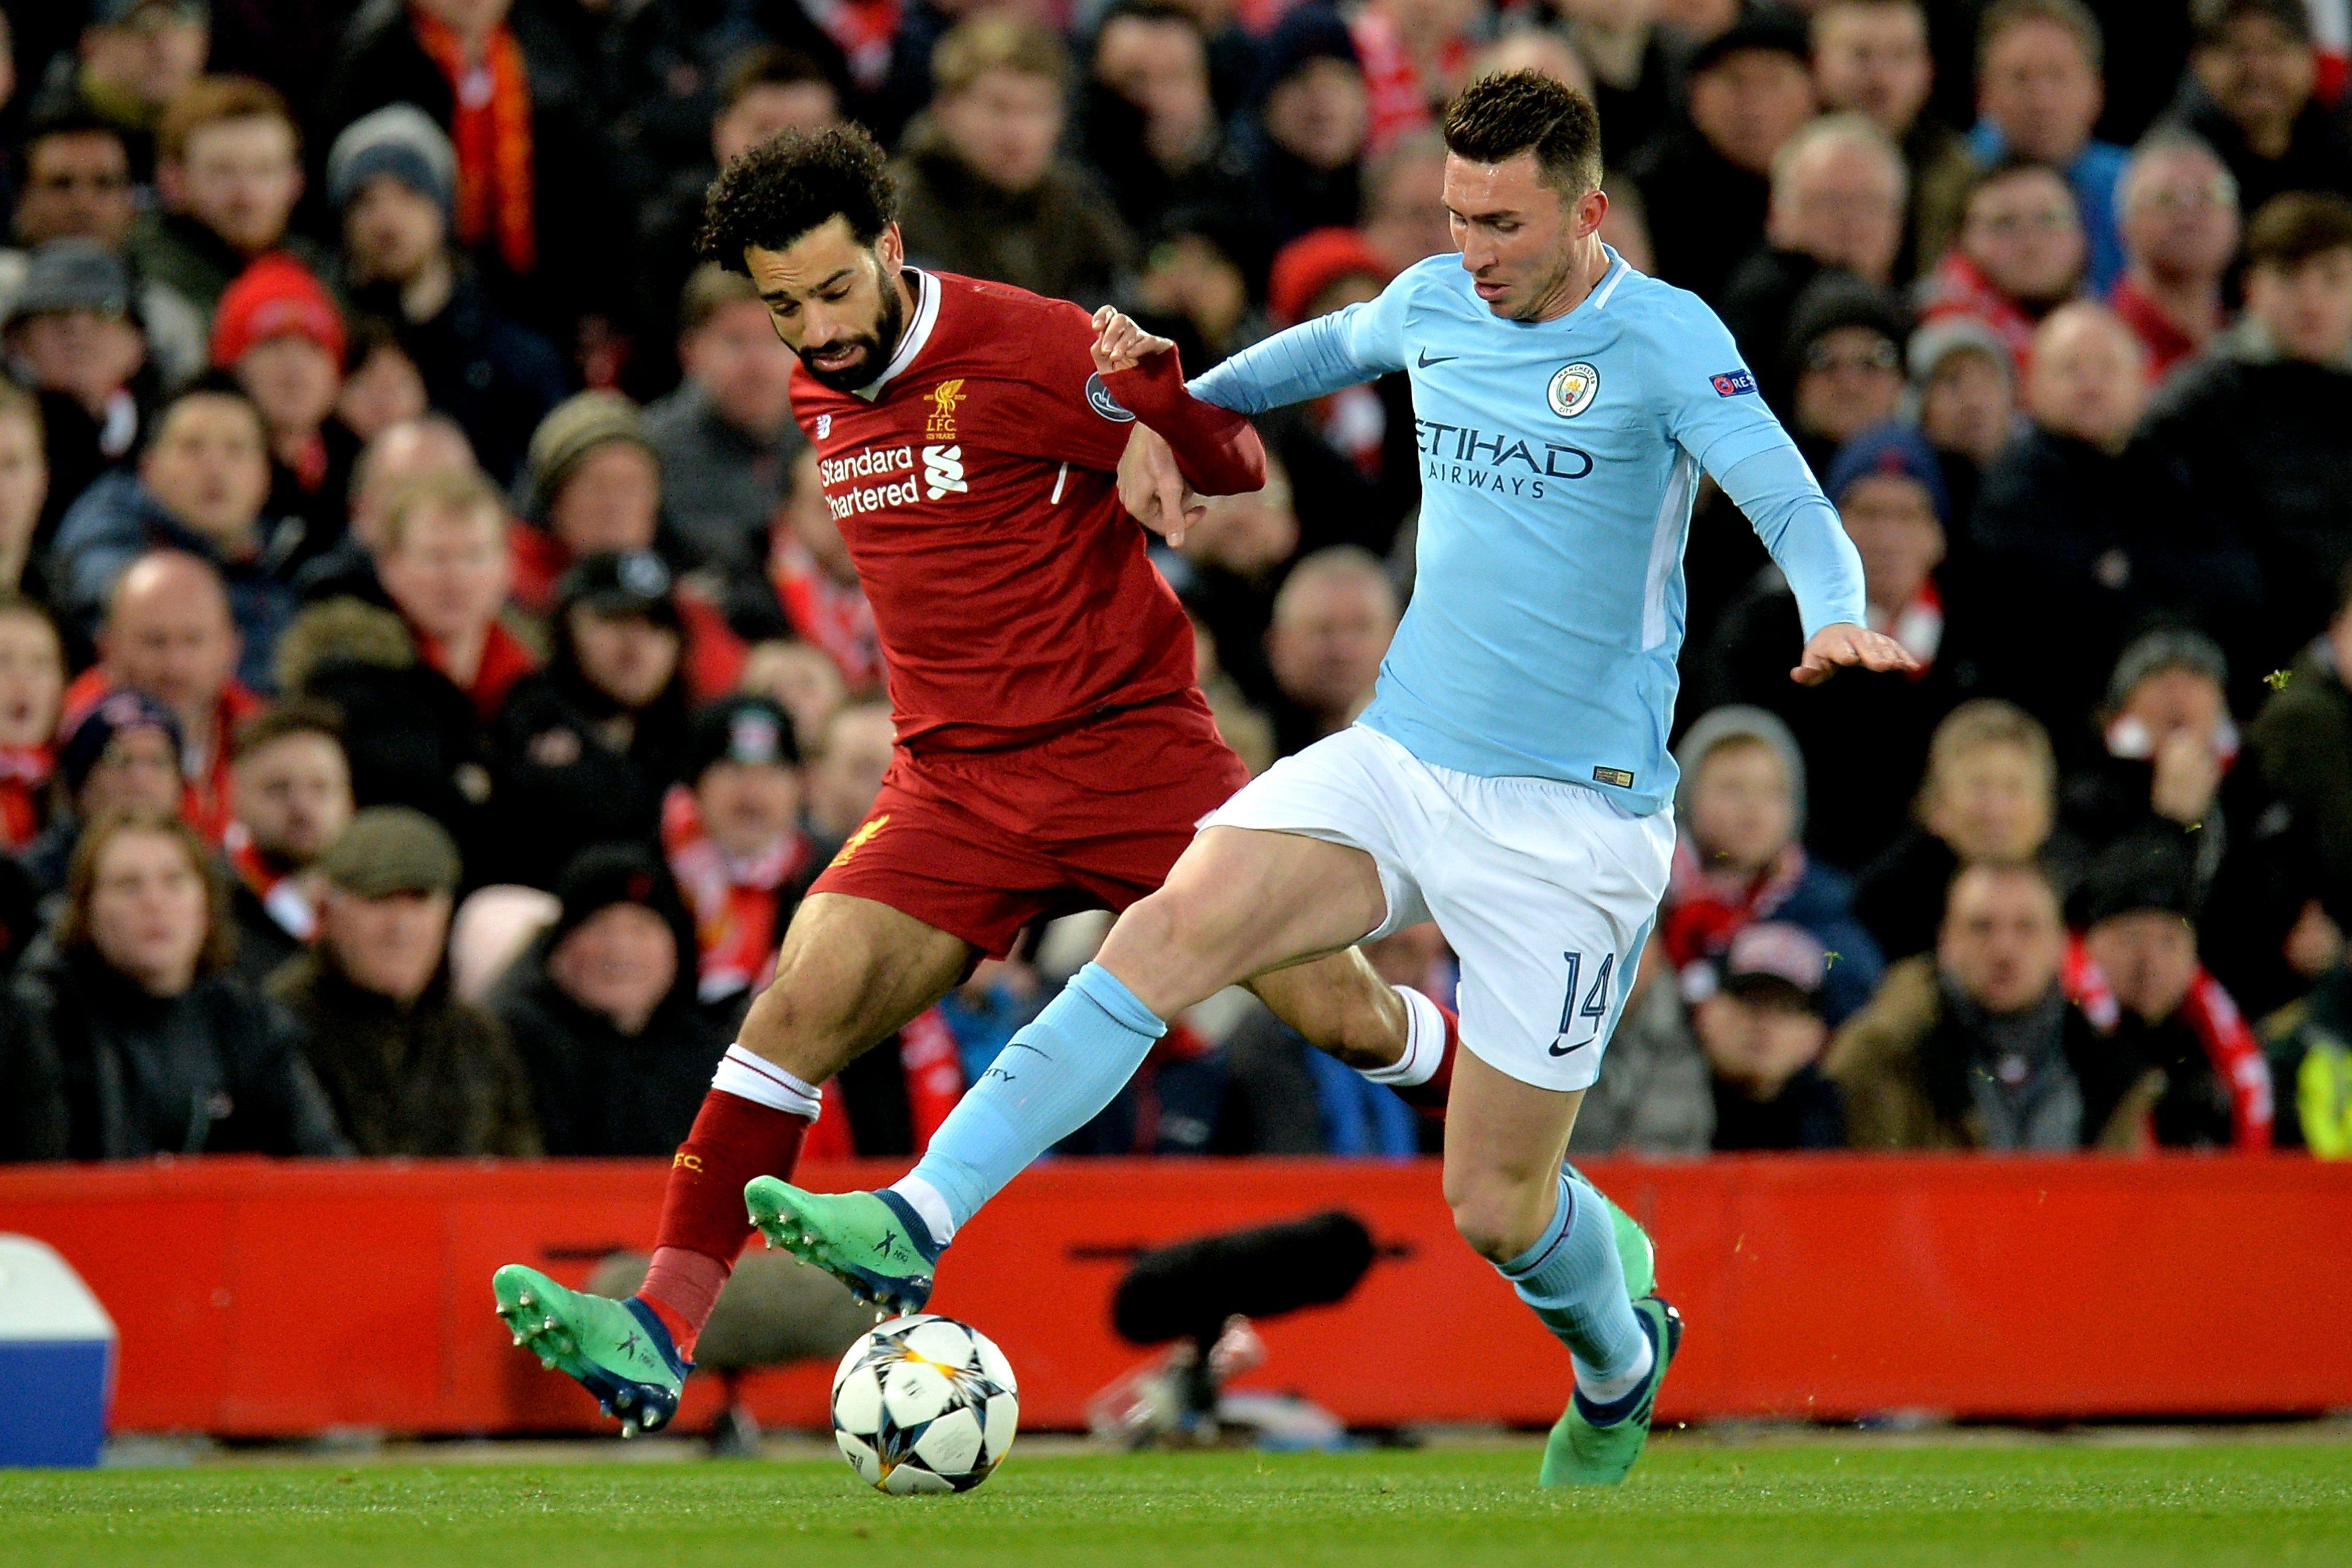 Salah v Laporte was a mismatch